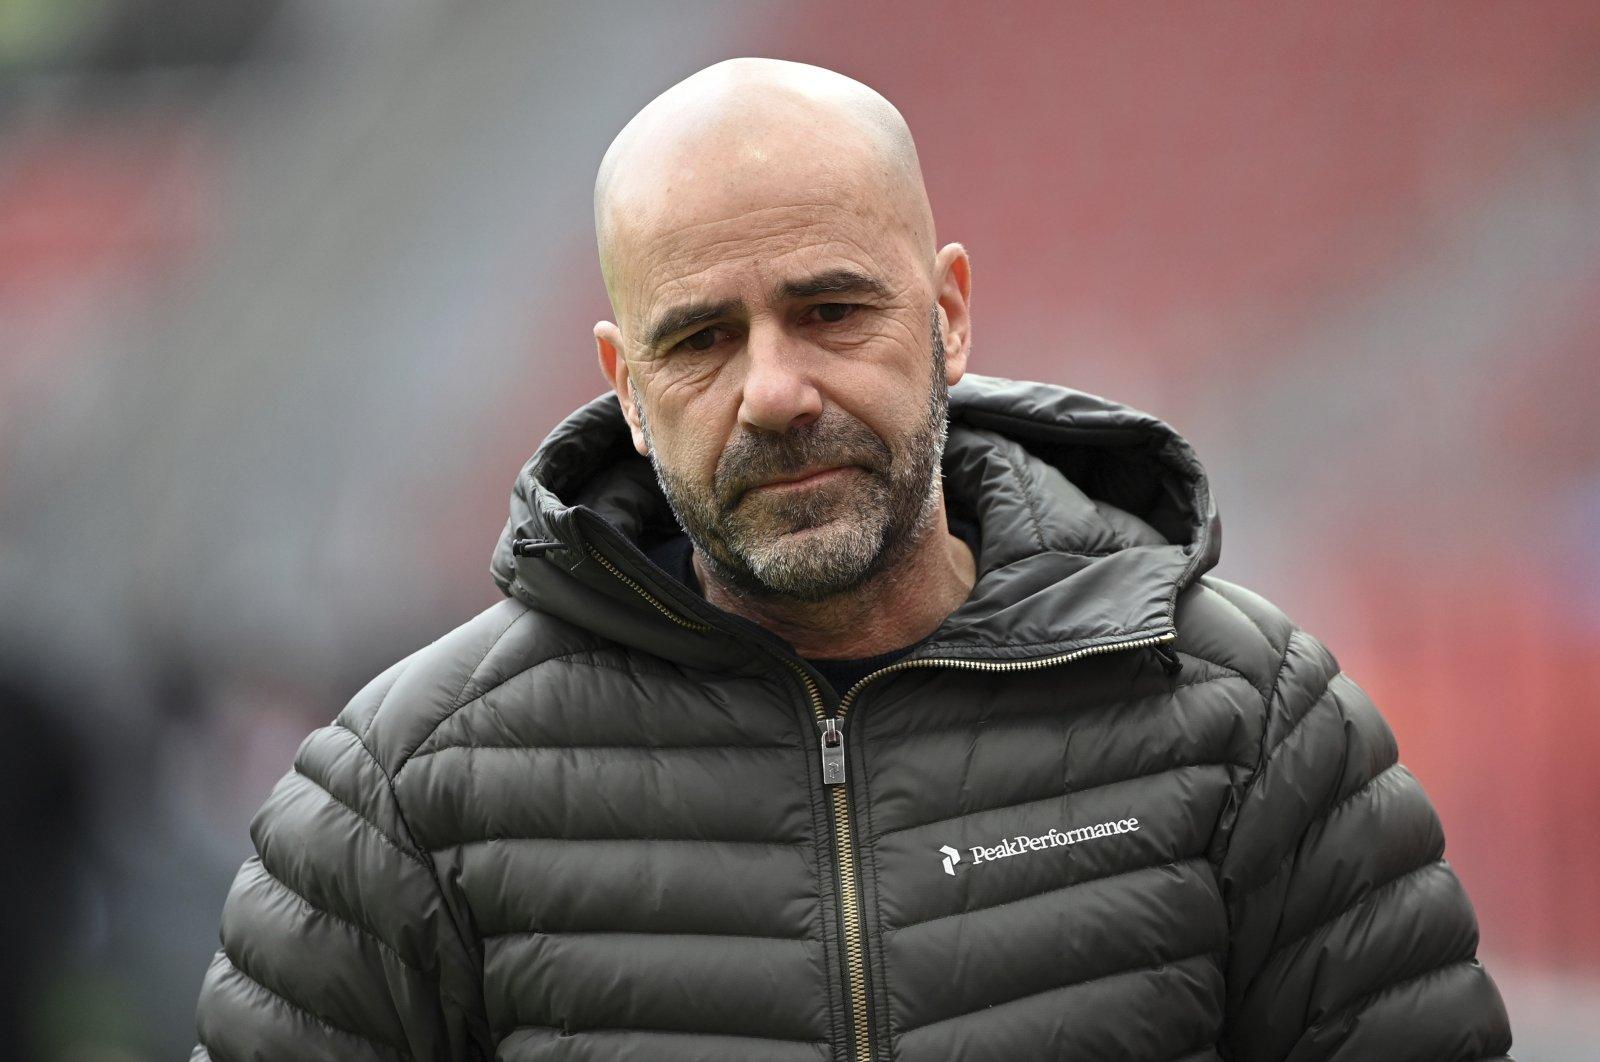 Leverkusen coach Peter Bosz before a Bundesliga match against Arminia Bielefeld in Leverkusen, Germany, March 14, 2021. (AP Photo)